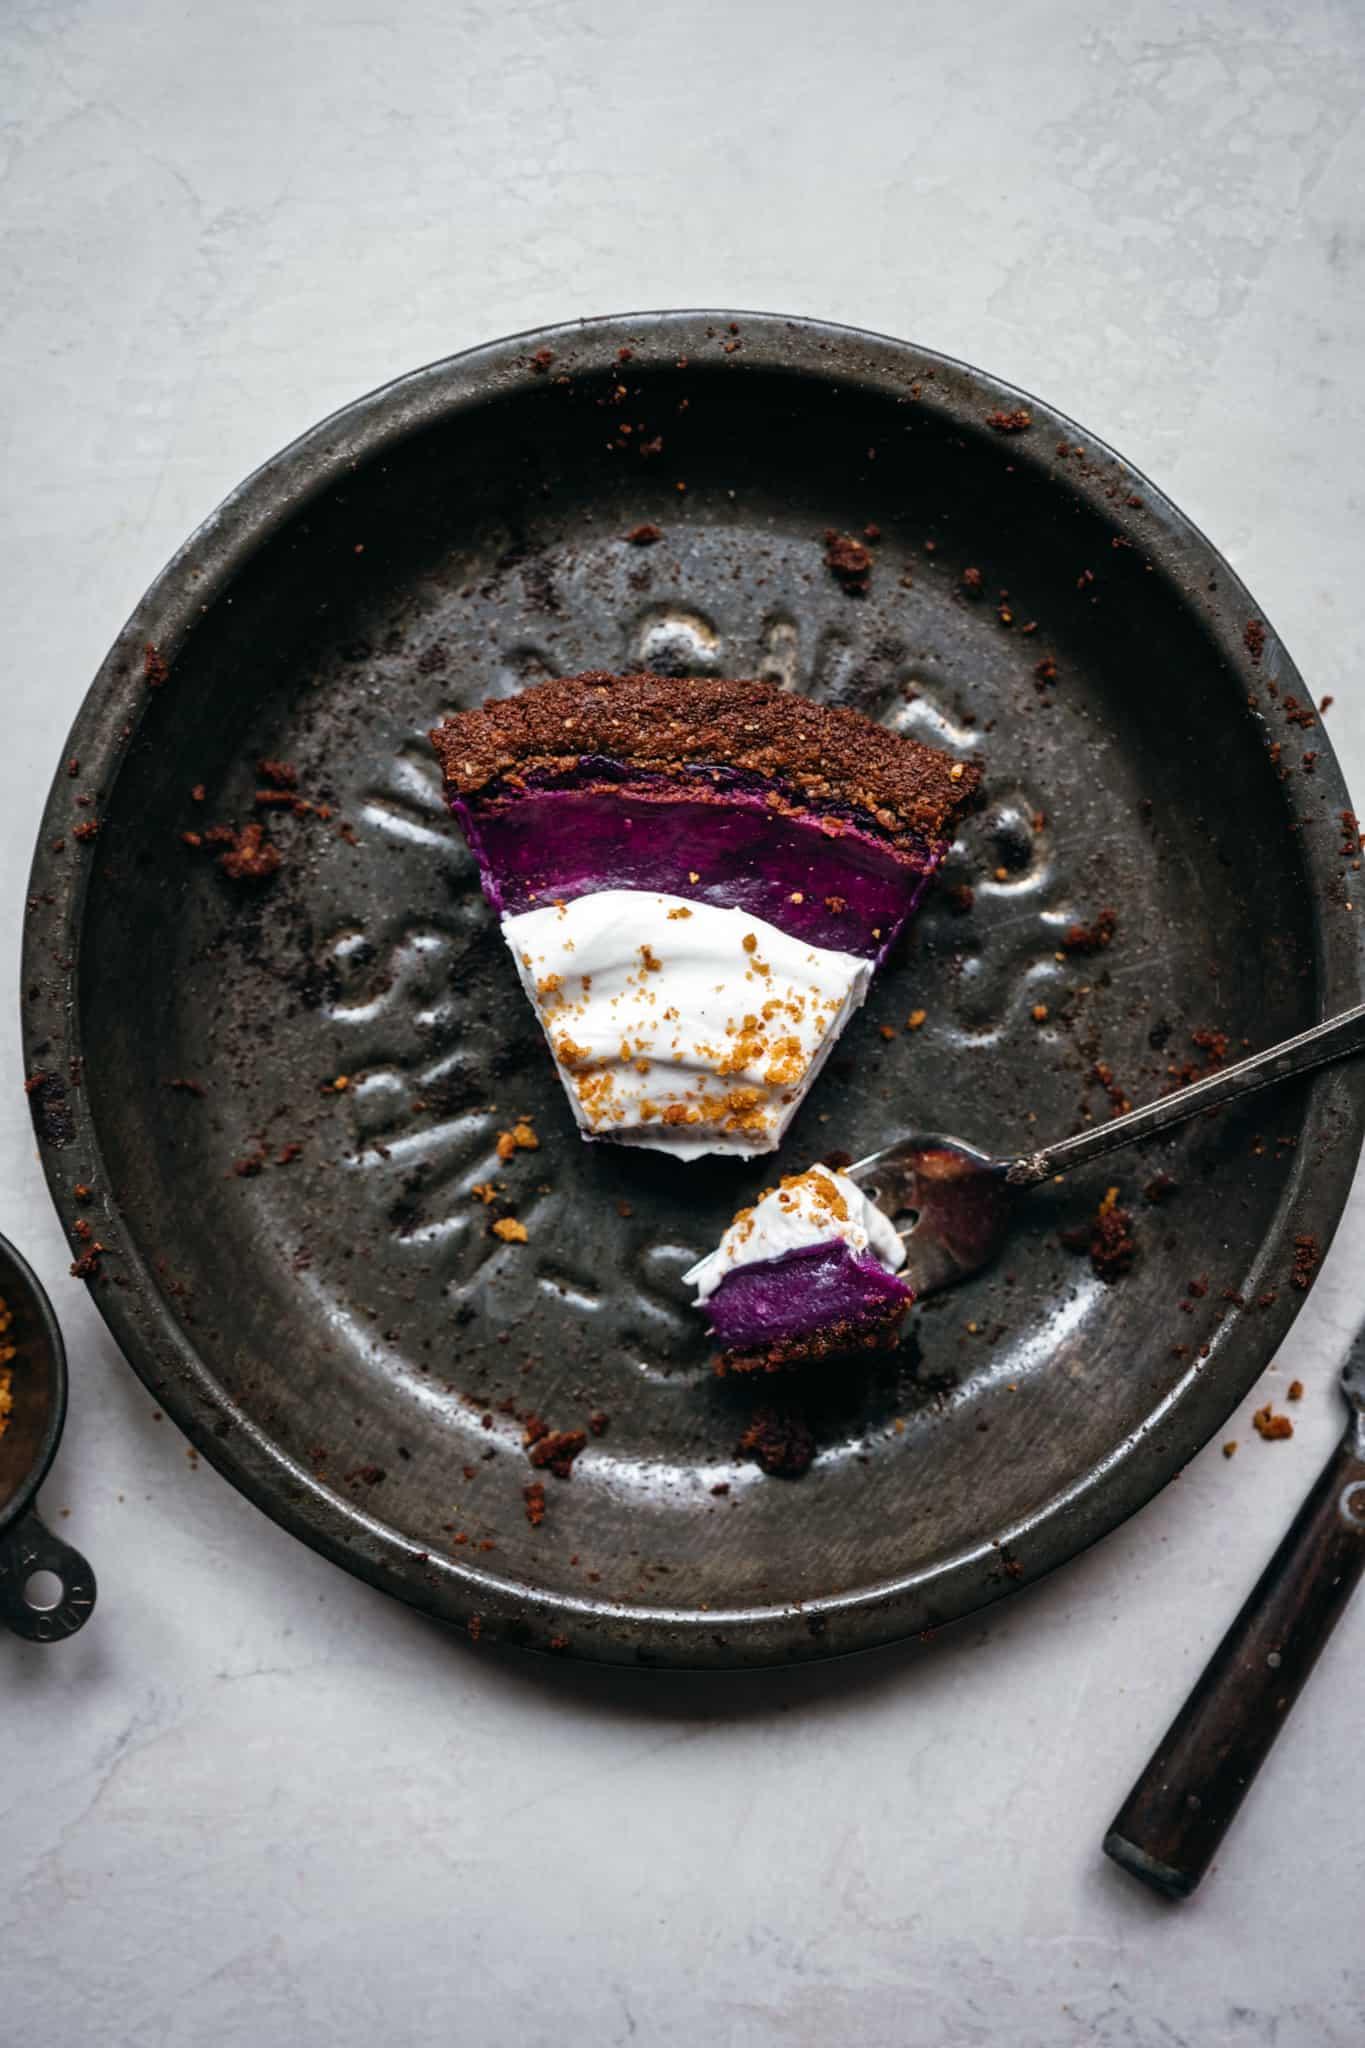 overhead view of slice of purple pie in antique pan